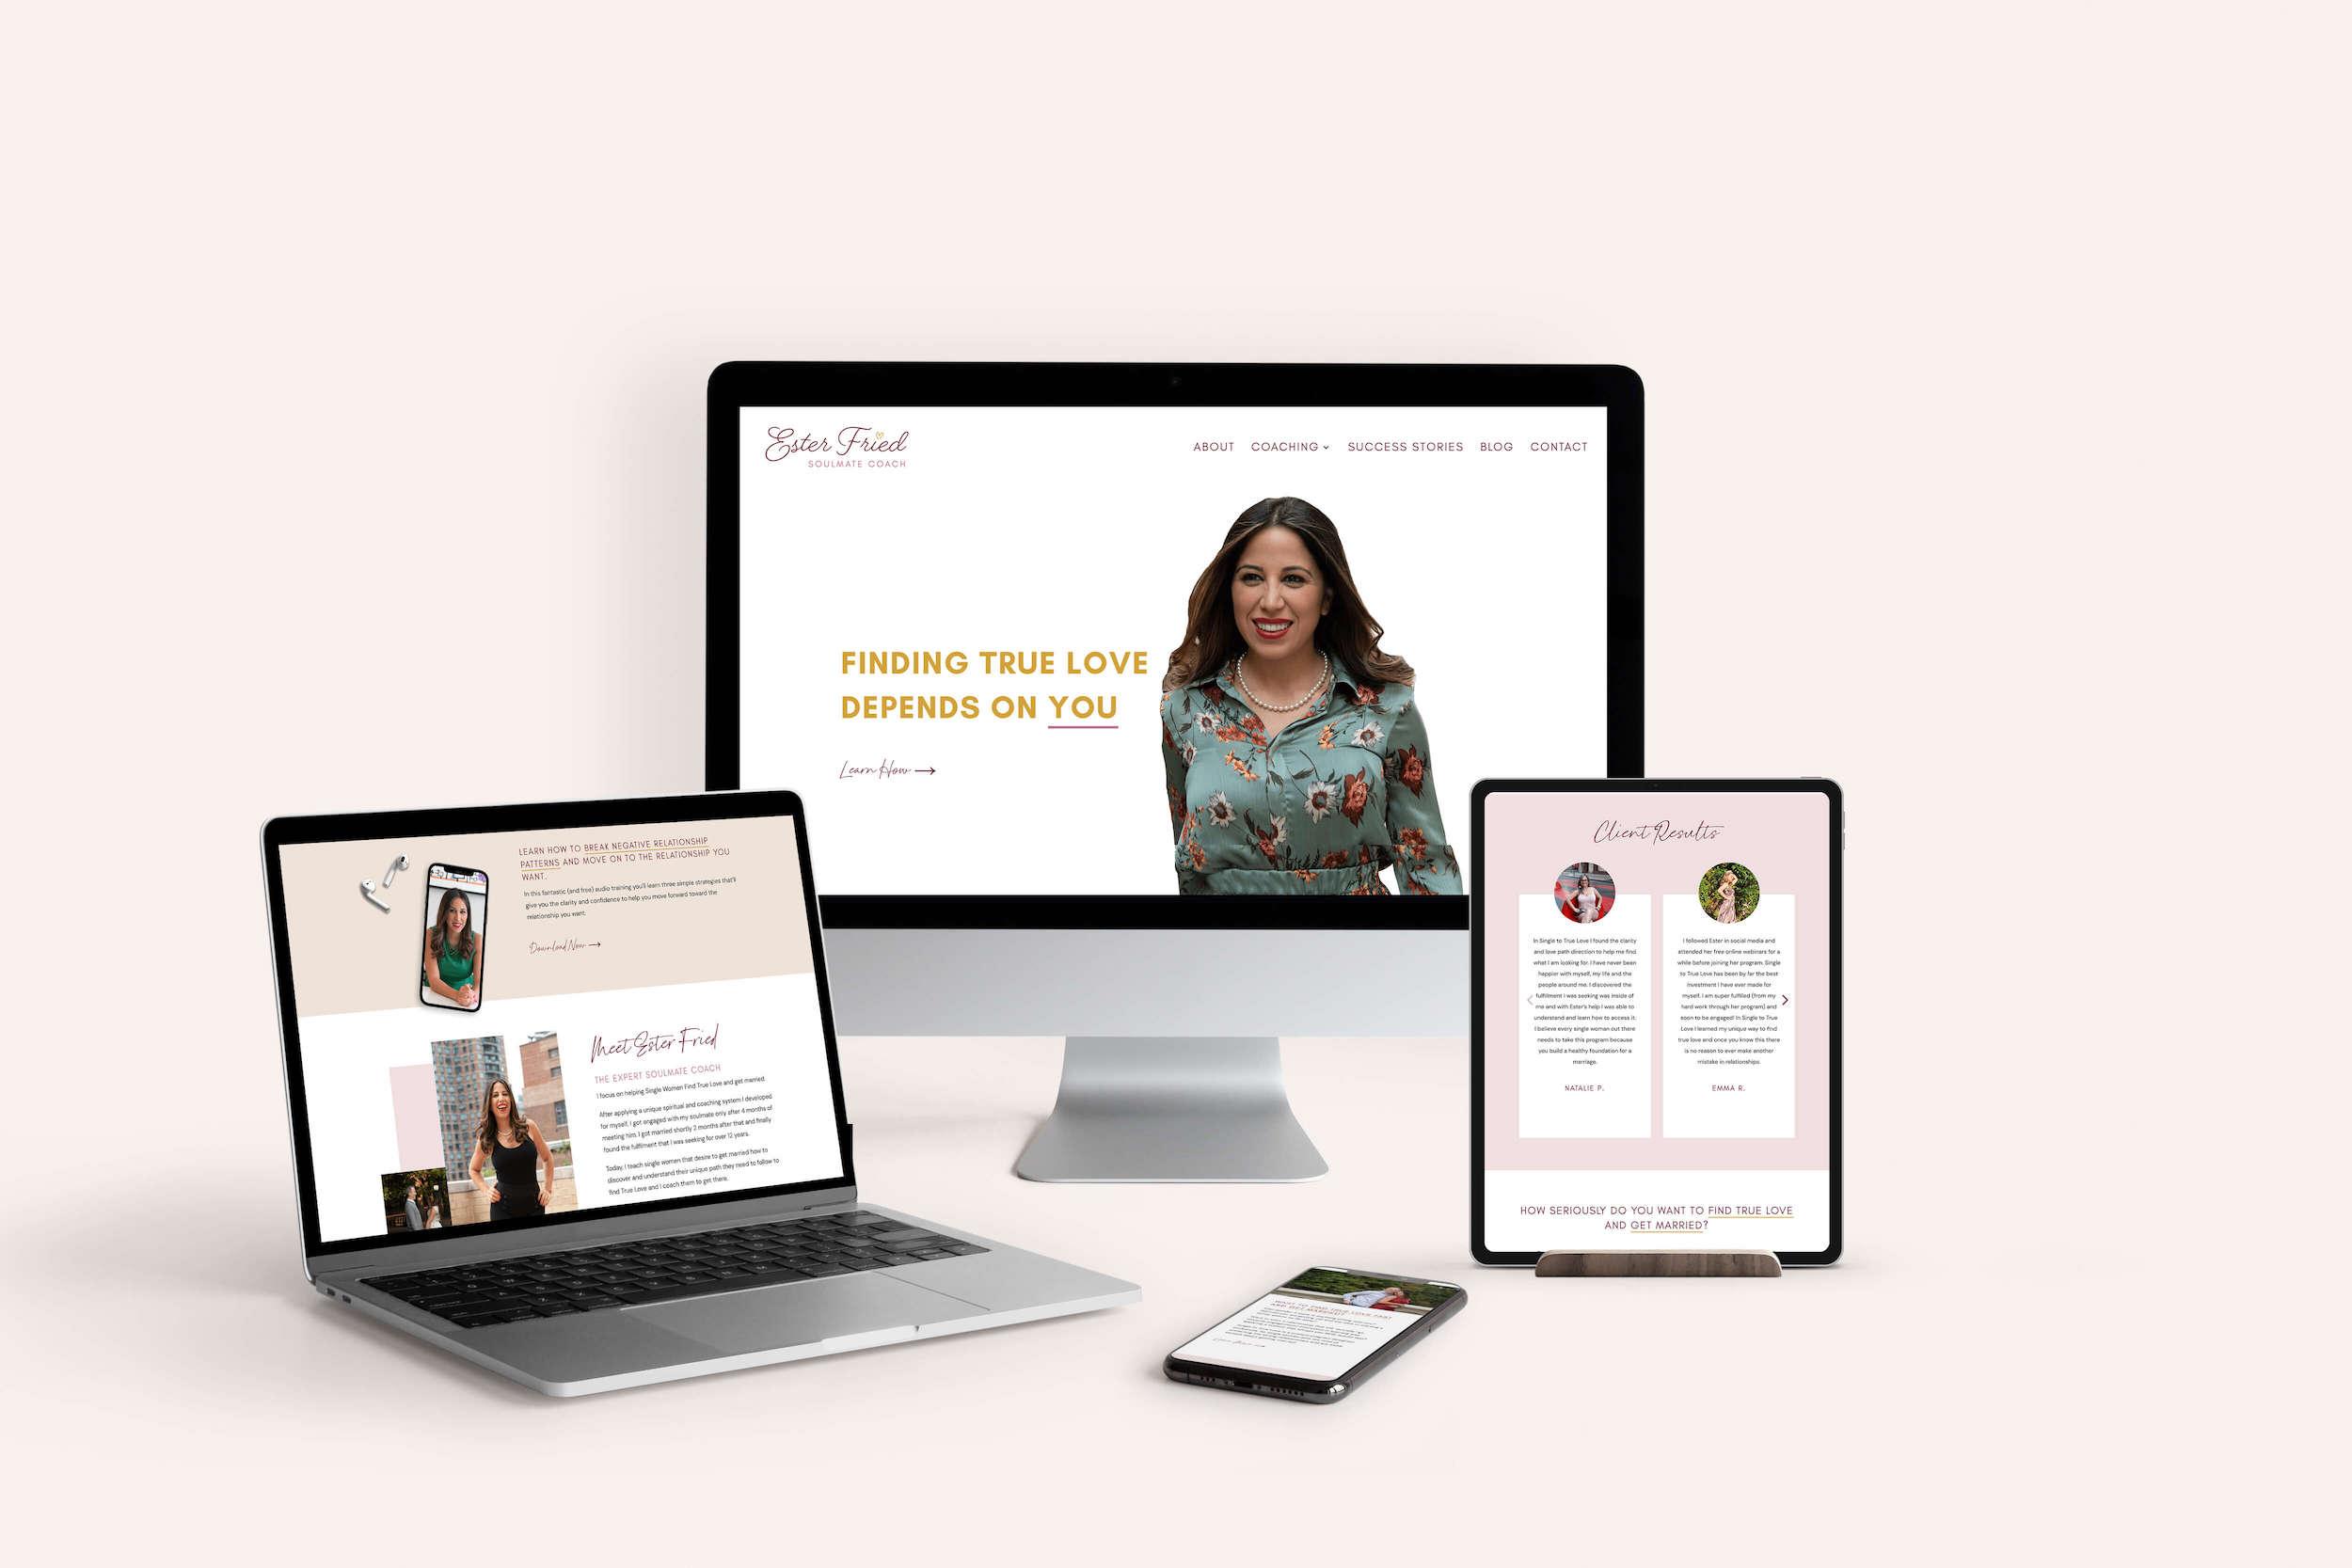 Responsive web design for Ester Fried